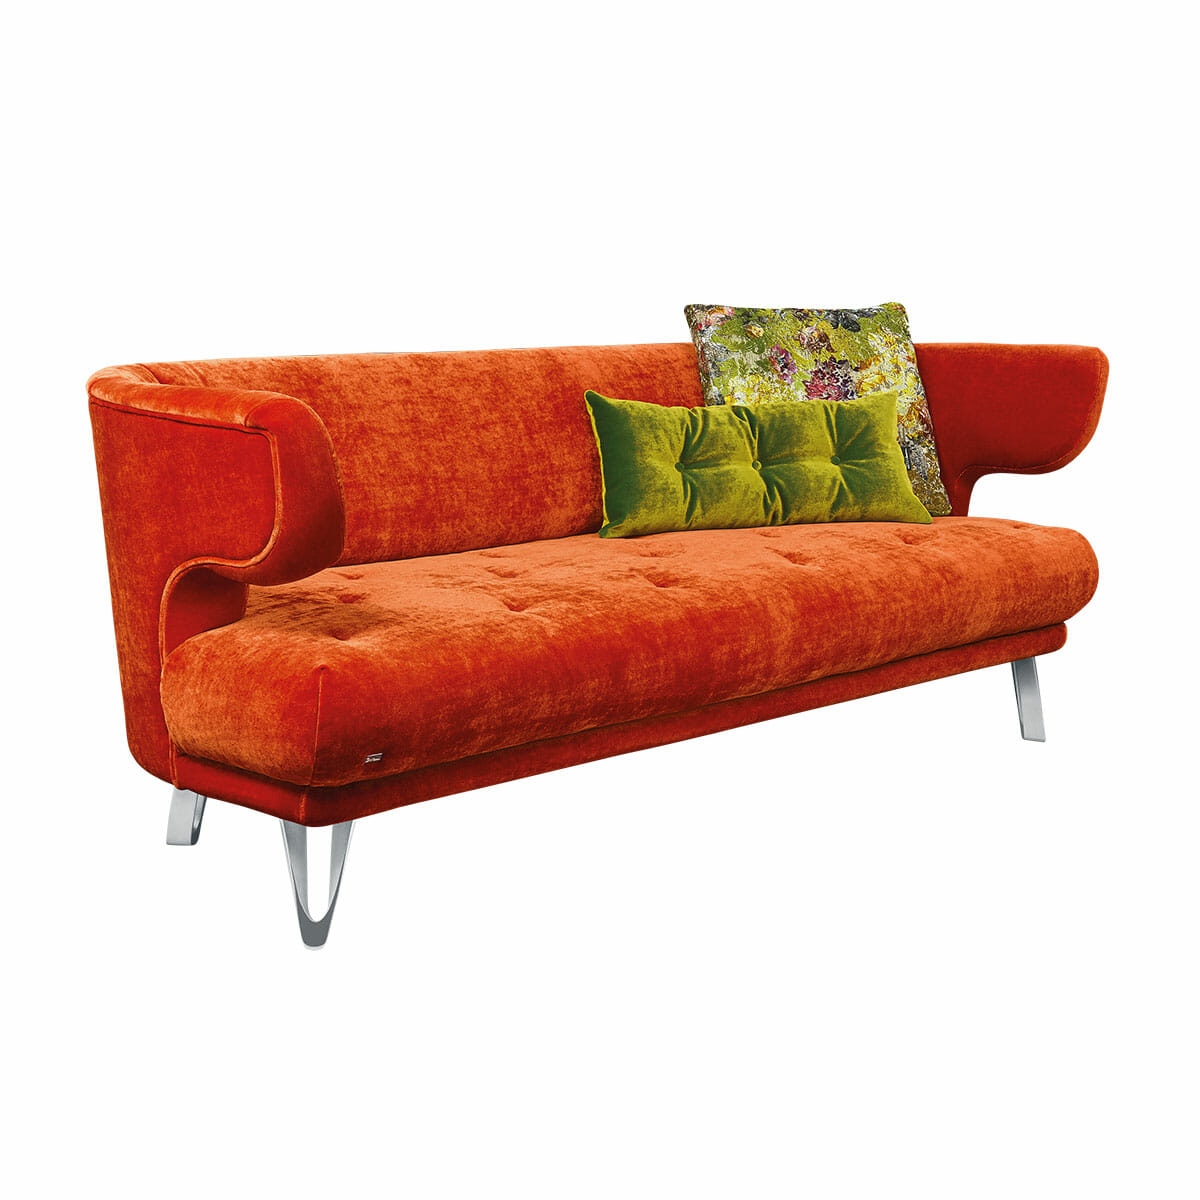 croissant by bretz top angebot an bretz croissant sofas ab. Black Bedroom Furniture Sets. Home Design Ideas